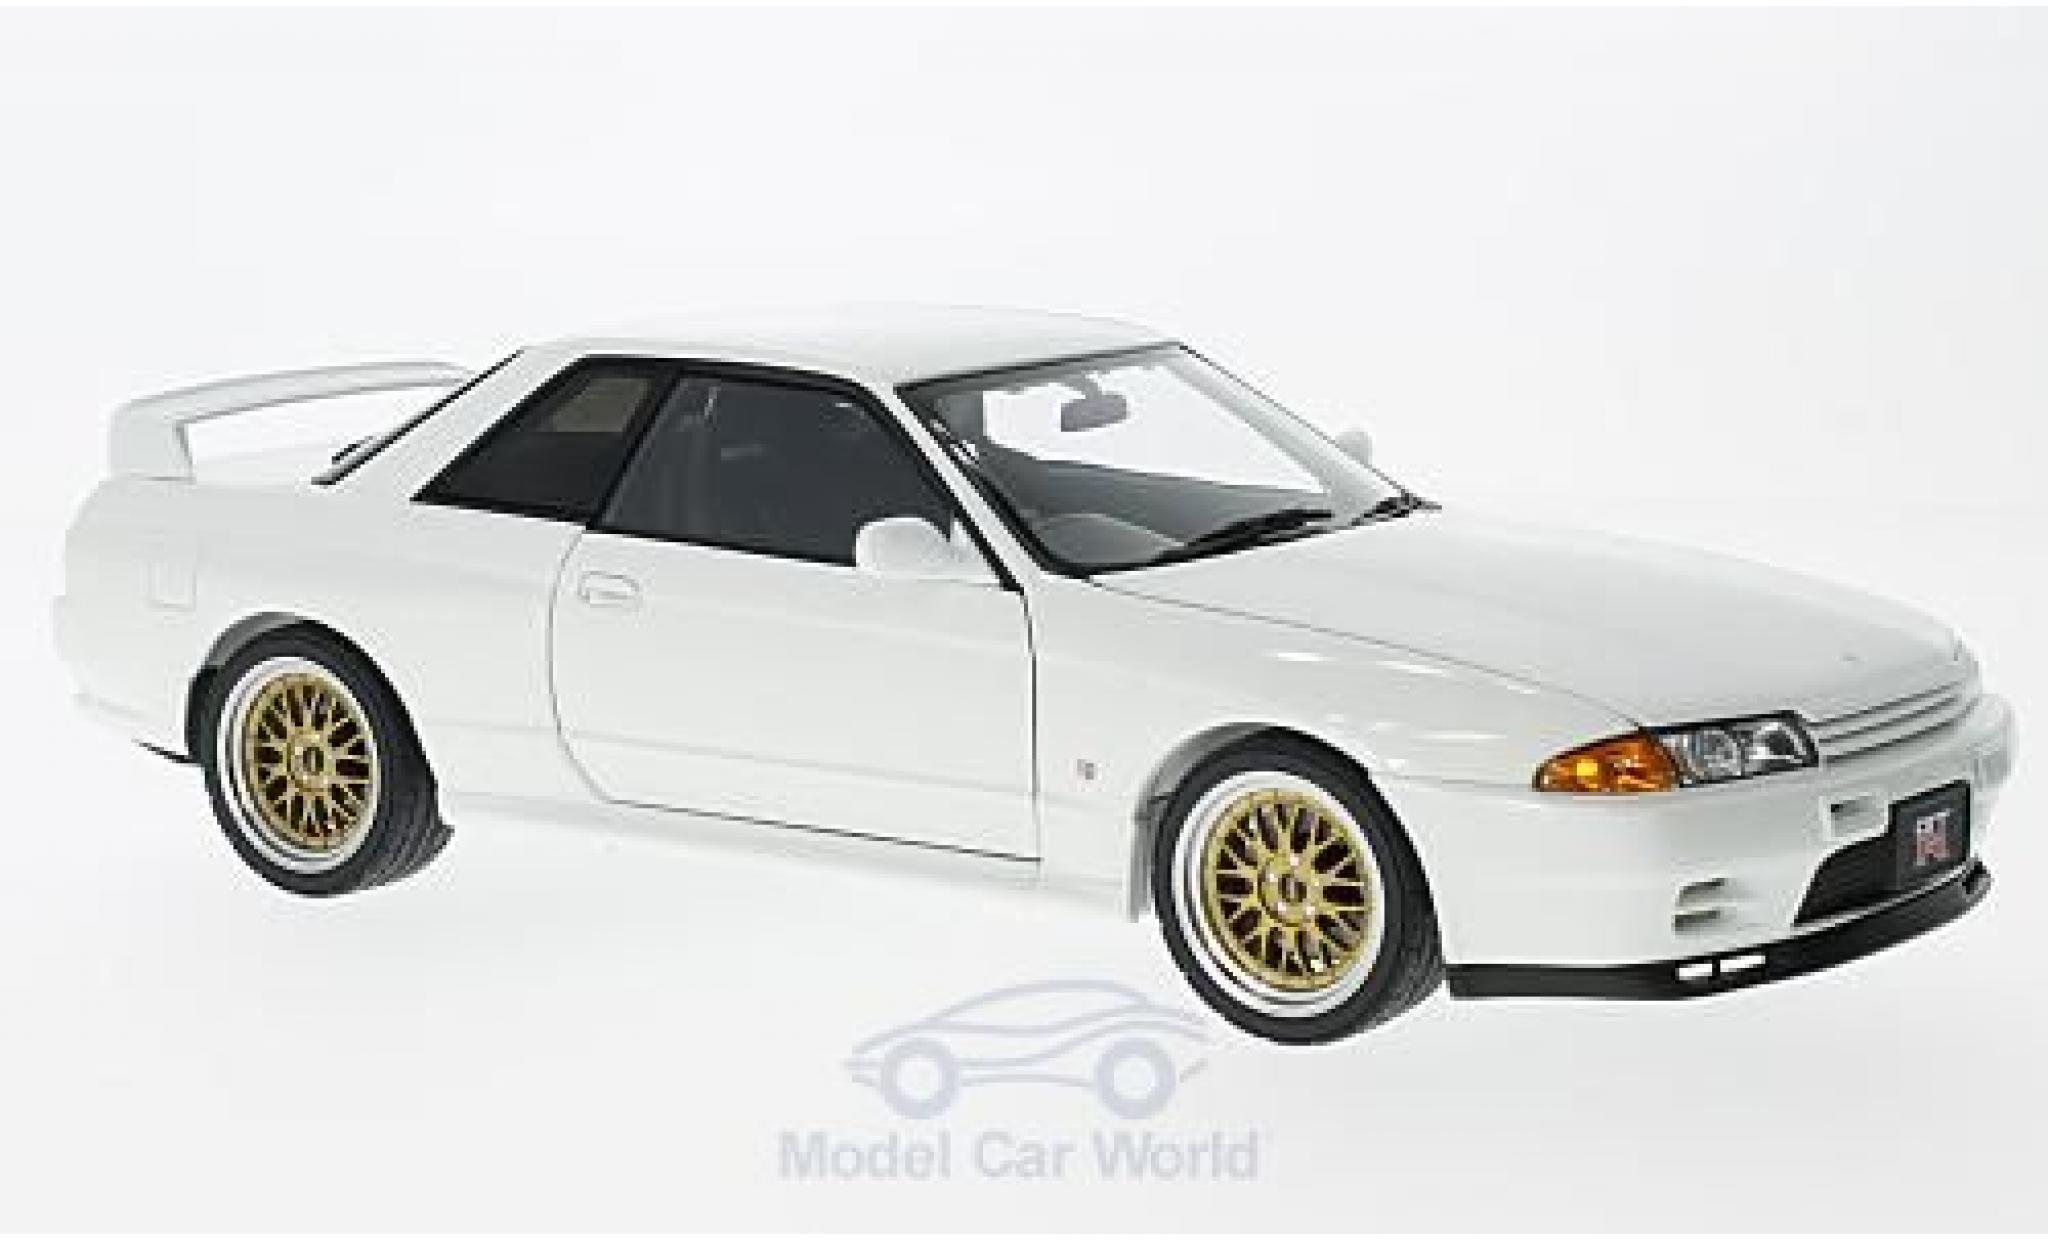 Nissan Skyline 1/18 AUTOart GT-R (R32) V-Spec II bianco RHD 1991 Tuned Version